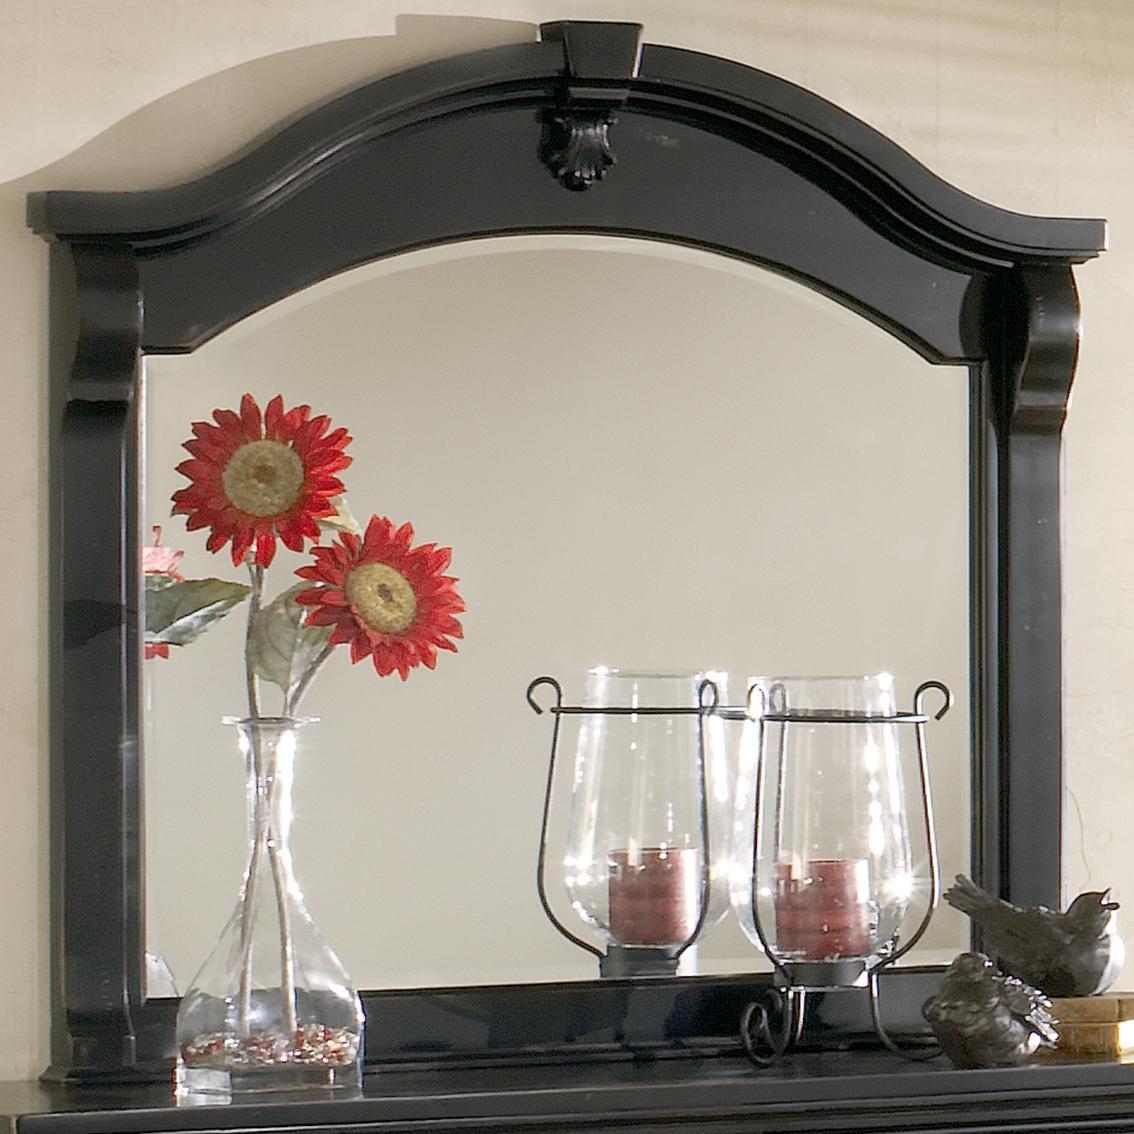 American Woodcrafters Heirloom Landscape Mirror - Item Number: 2900-040